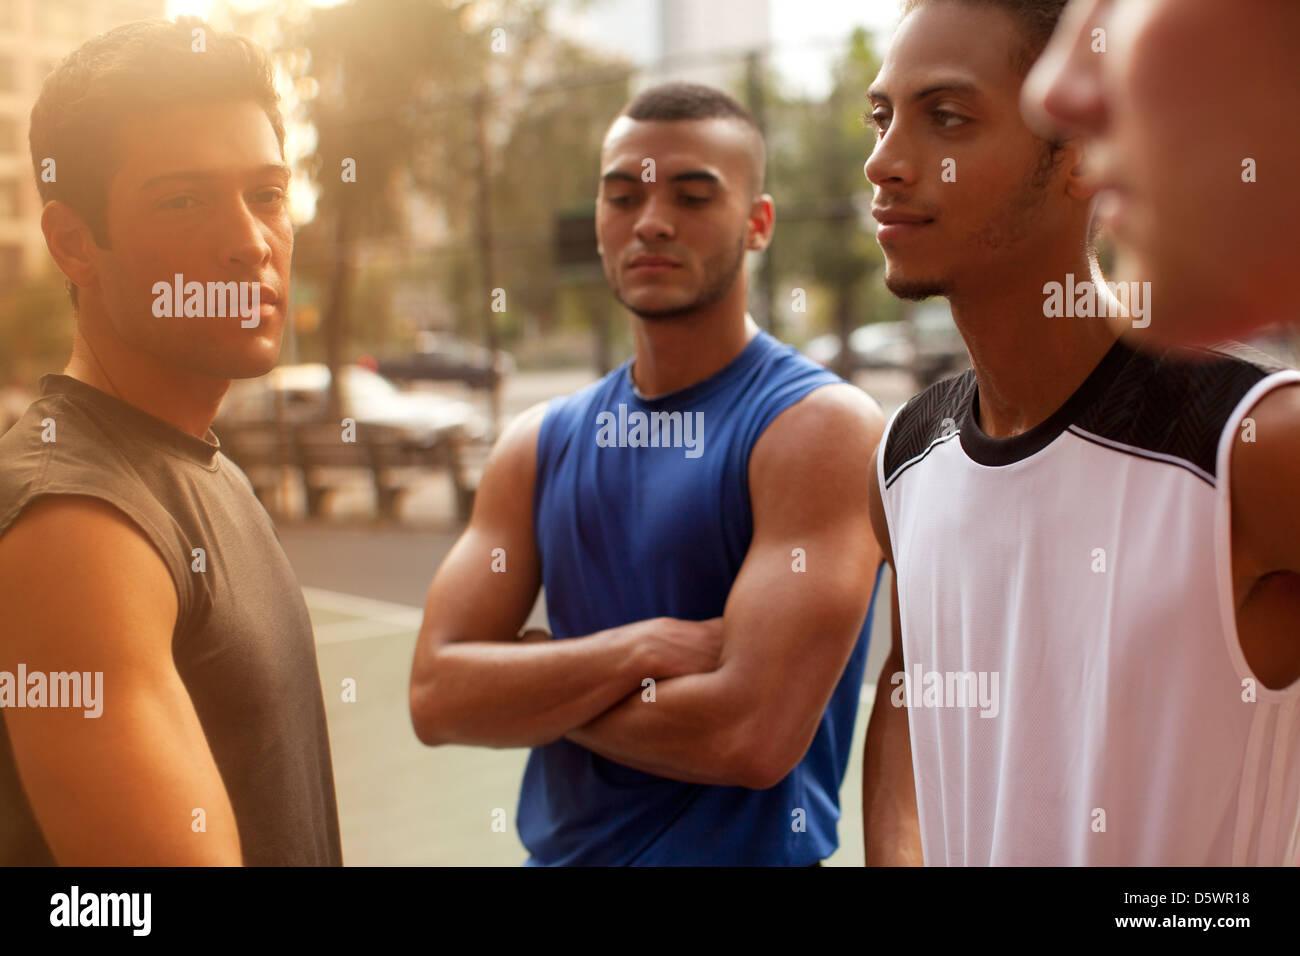 Men standing on basketball court - Stock Image